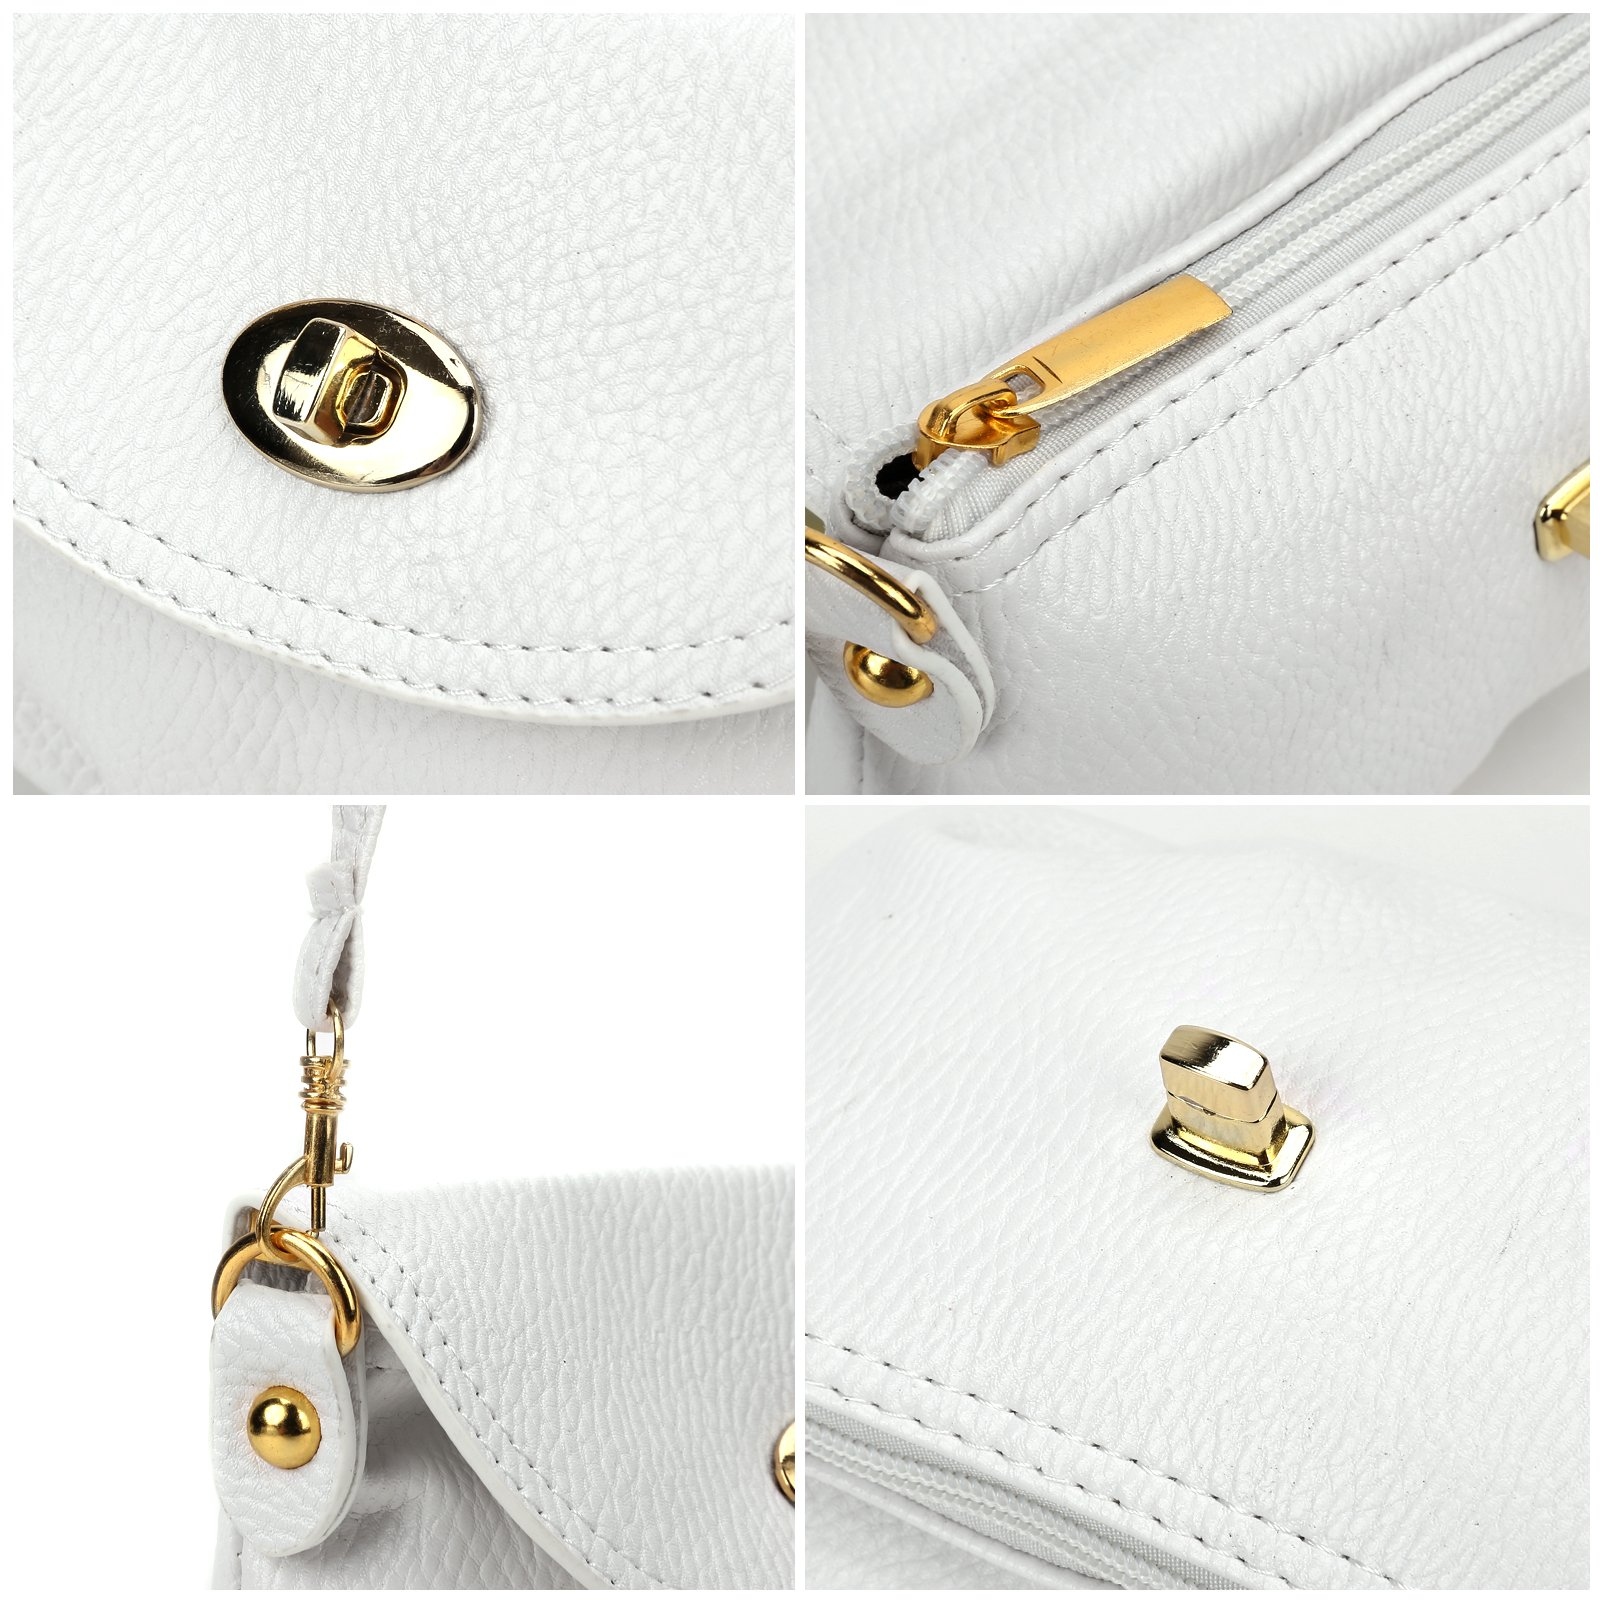 Ladies Mini SMALL Handbag Envelope Crossbody Shoulder Messenger Totes Bag Purse by Anladia (Image #6)